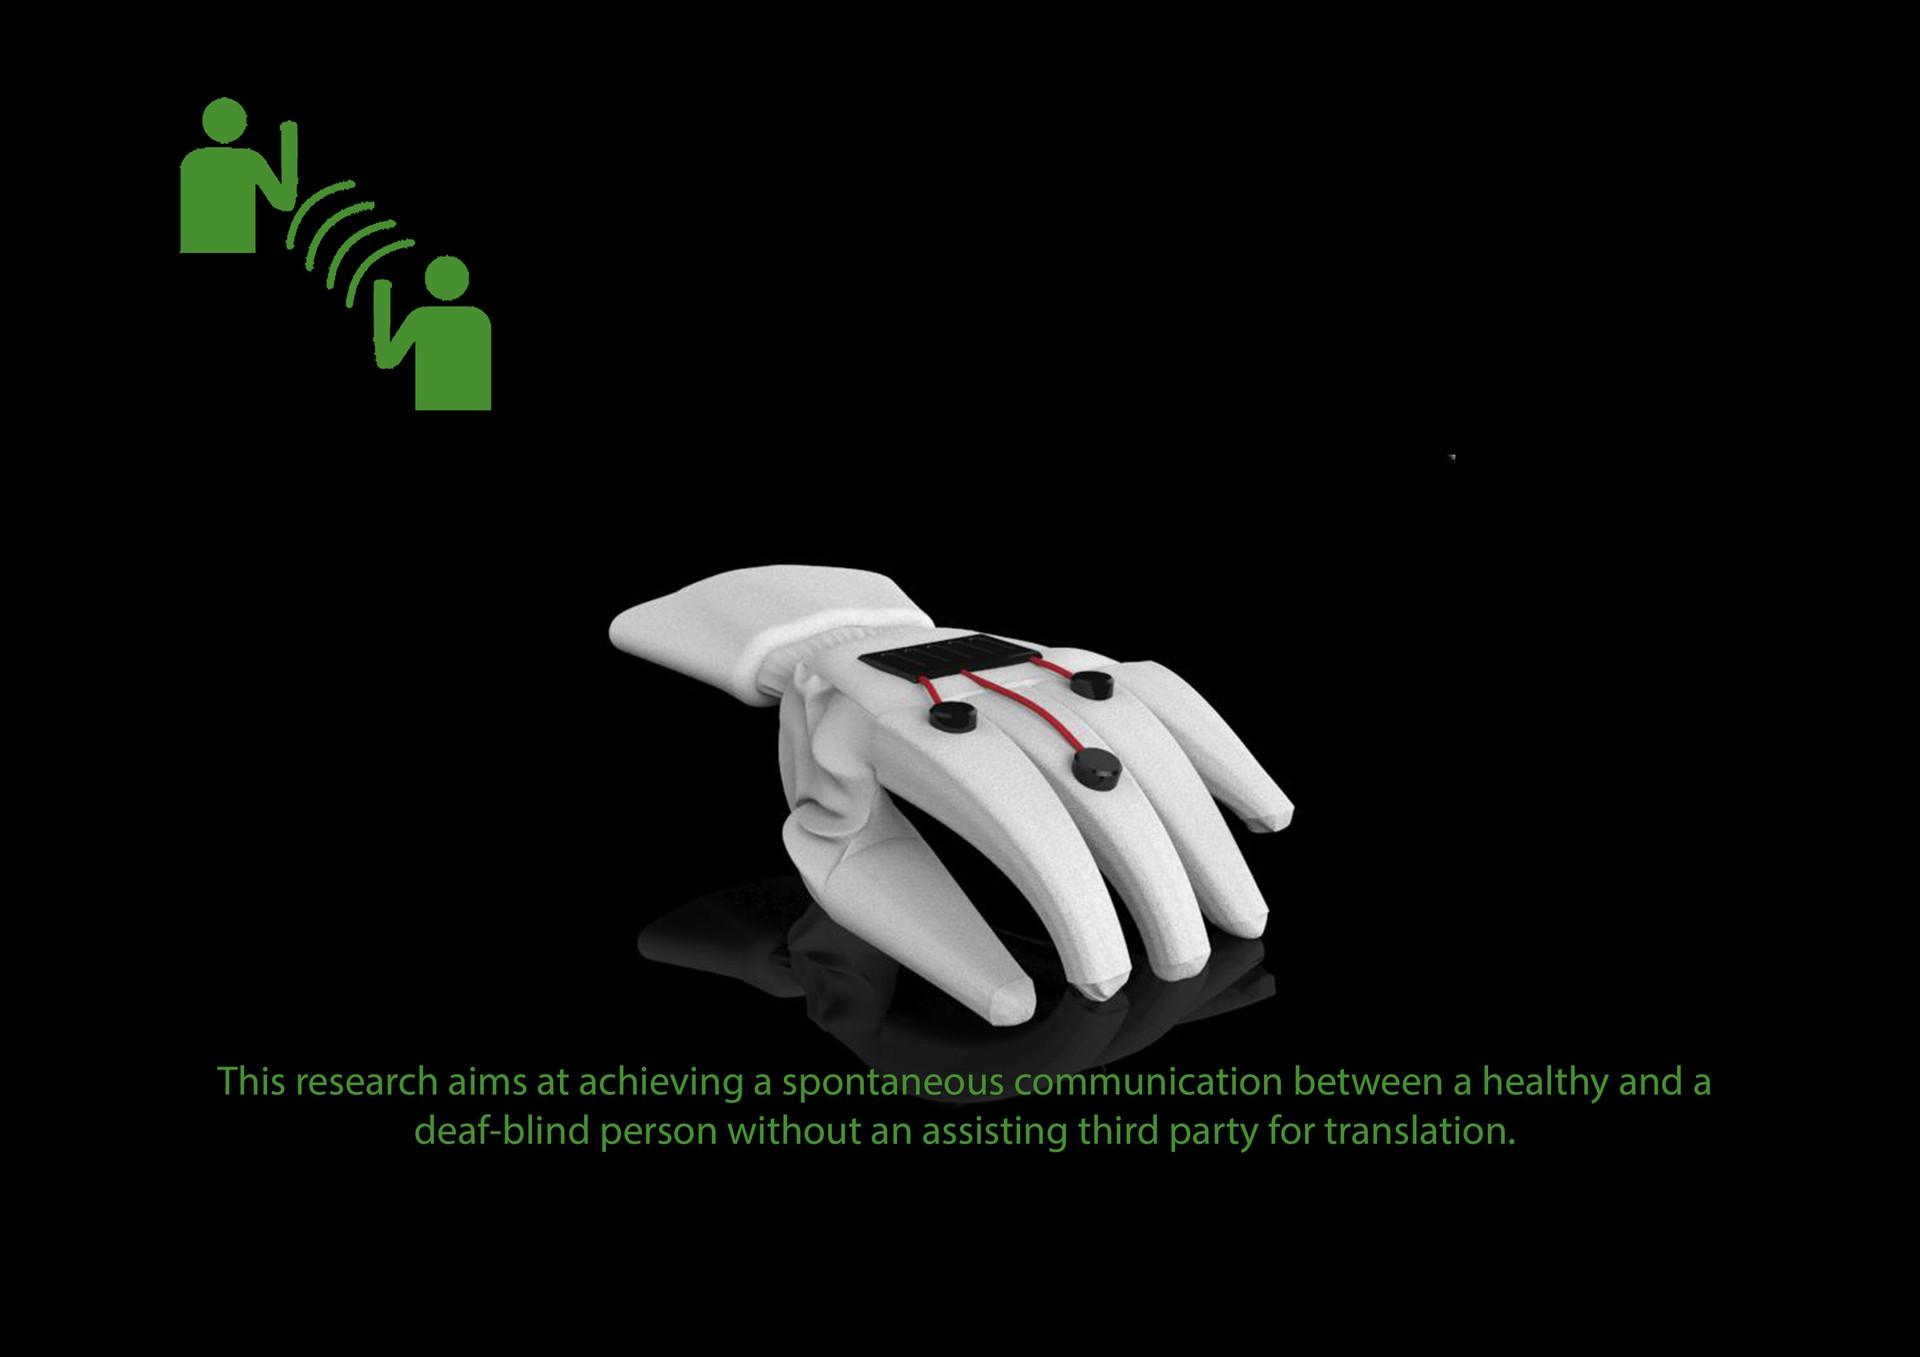 Vibro-Tactile Communication6